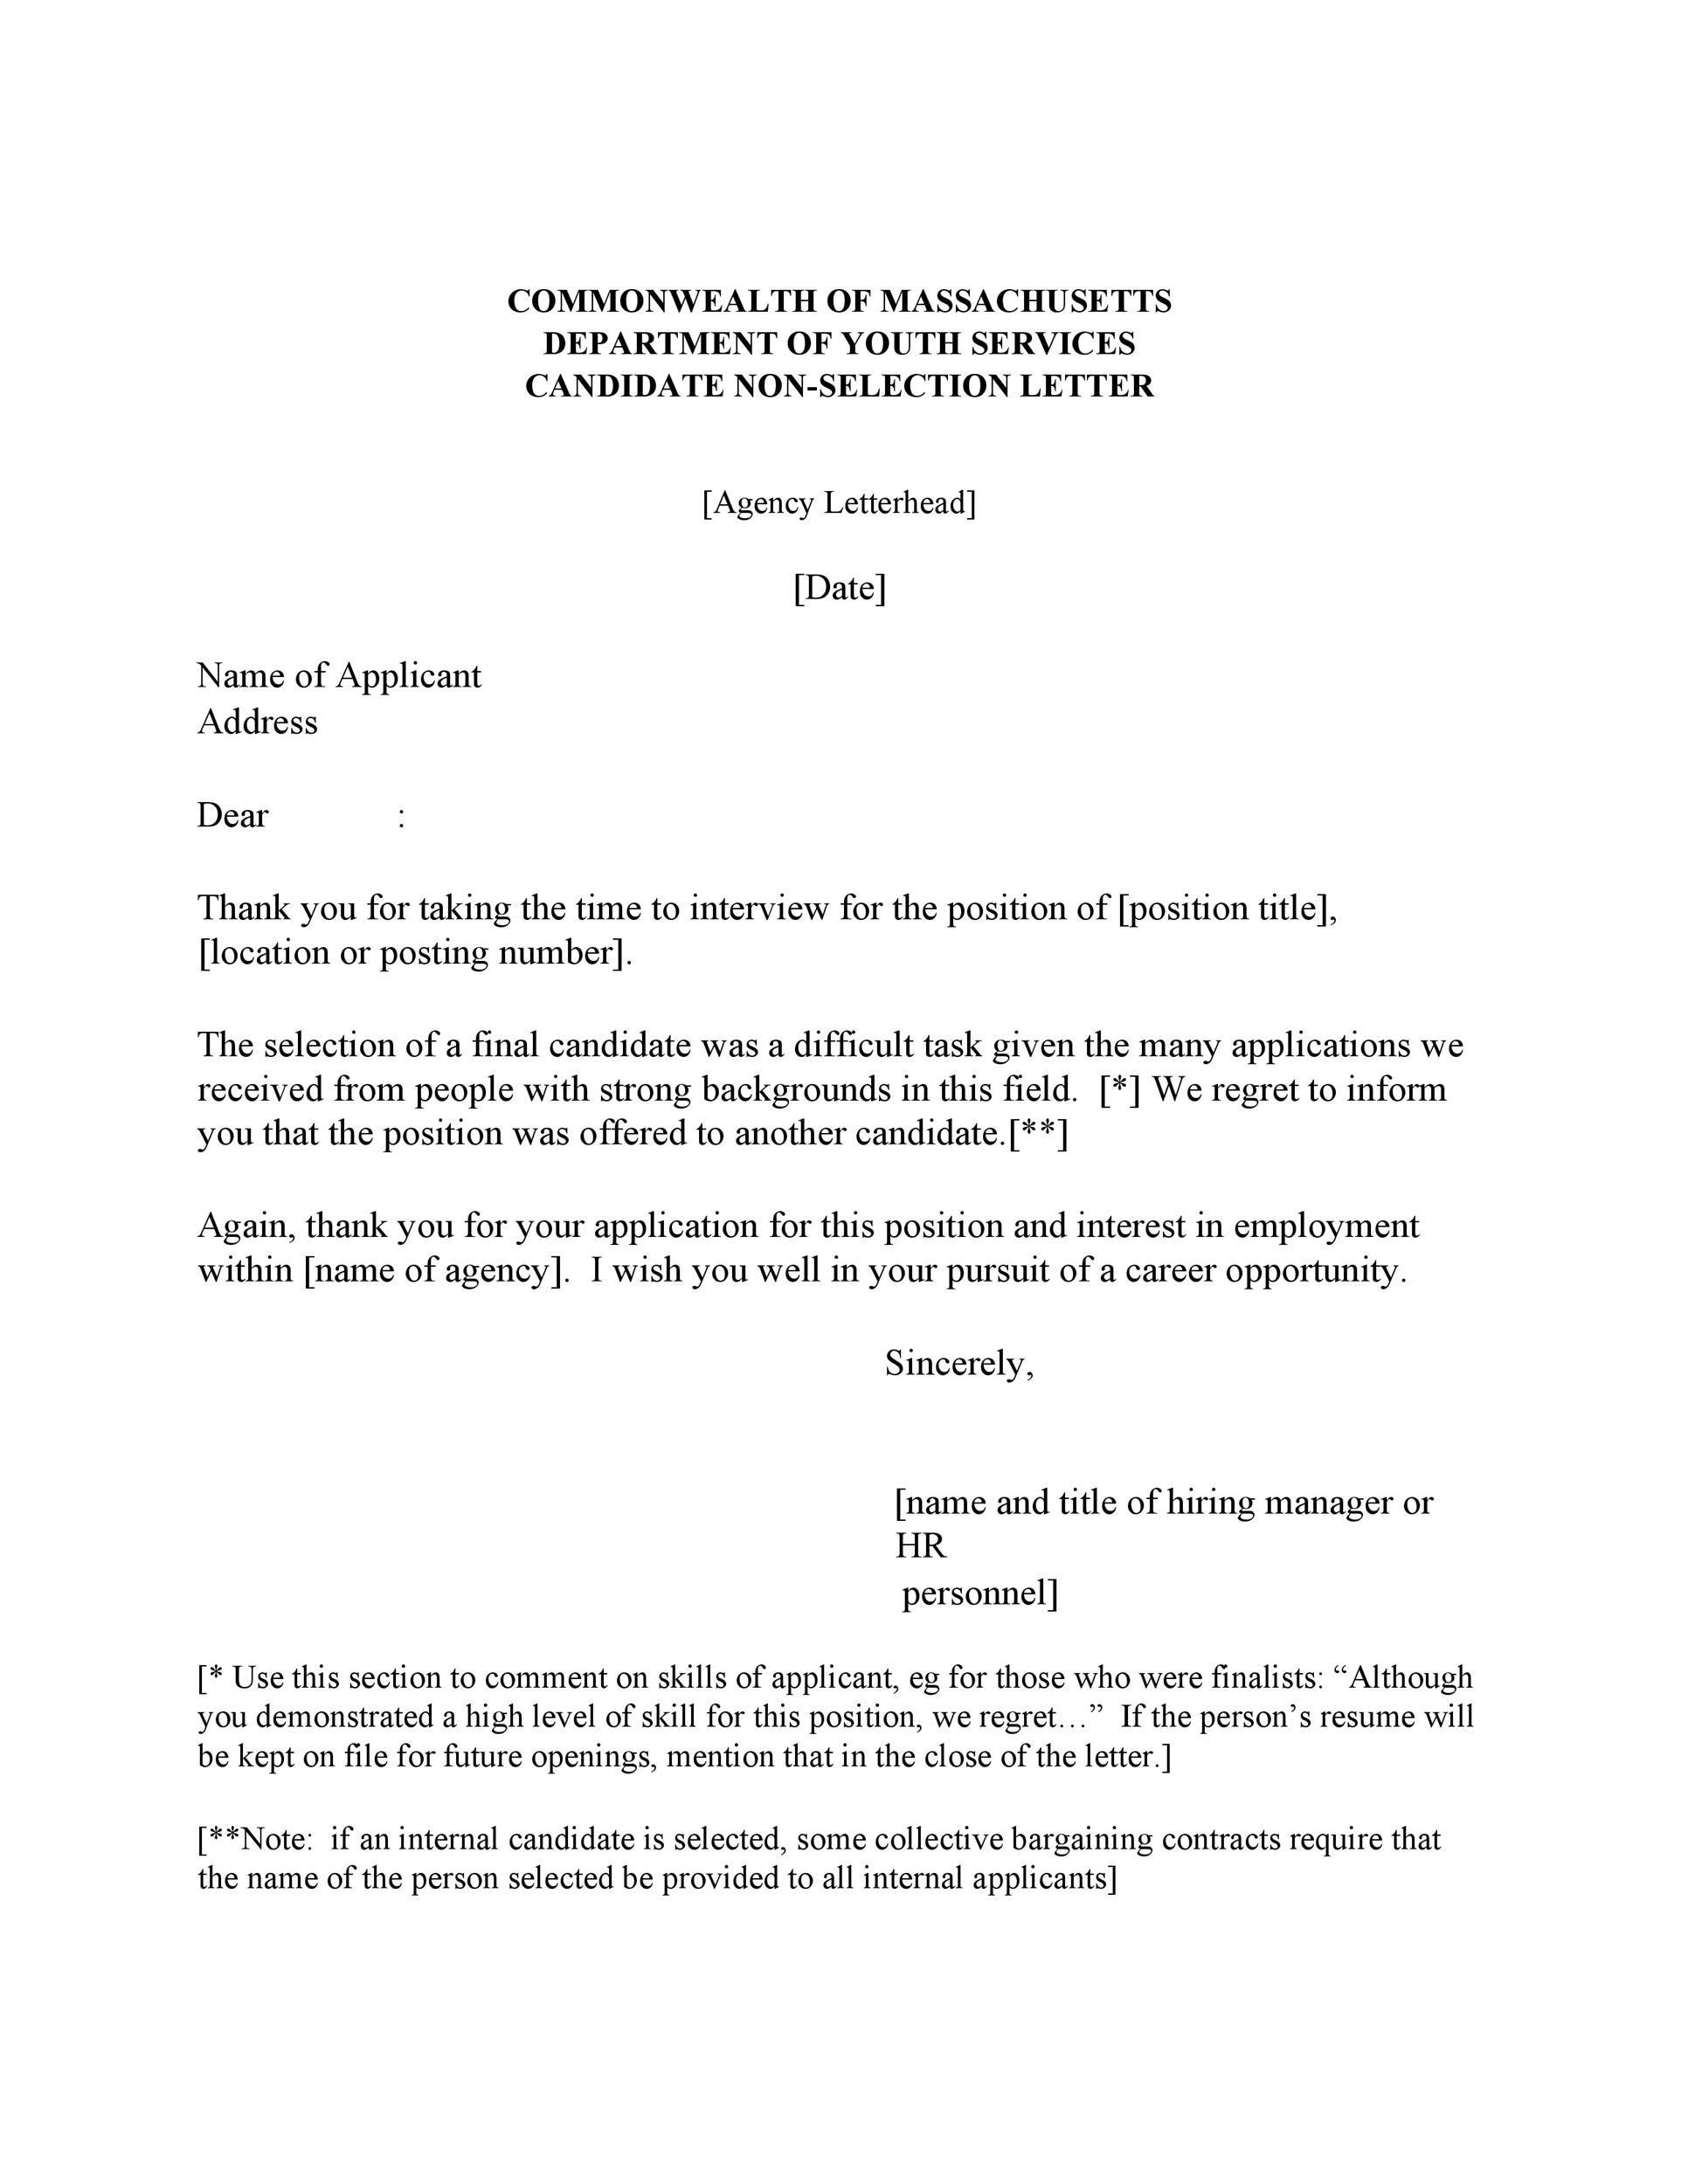 39 Job Rejection Letter Templates  Samples ᐅ Template Lab